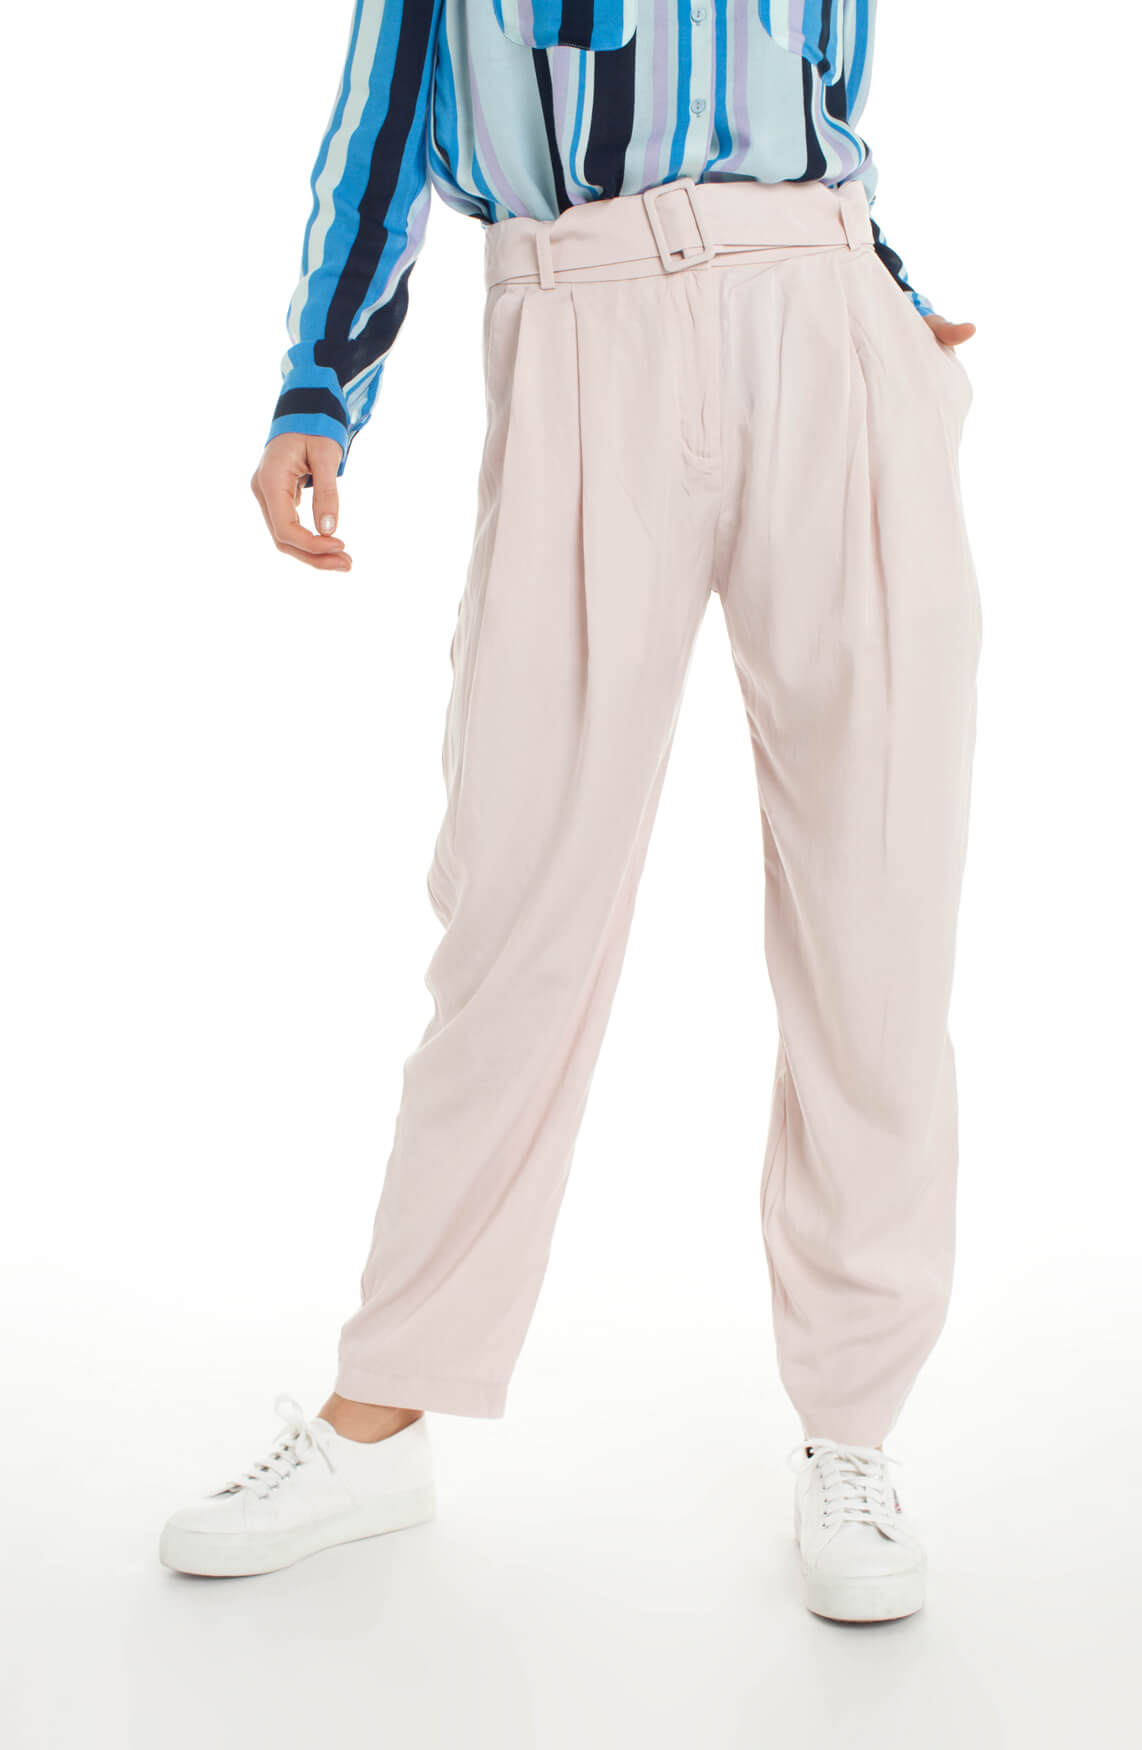 Samsoe Samsoe Dames Aniko pantalon roze